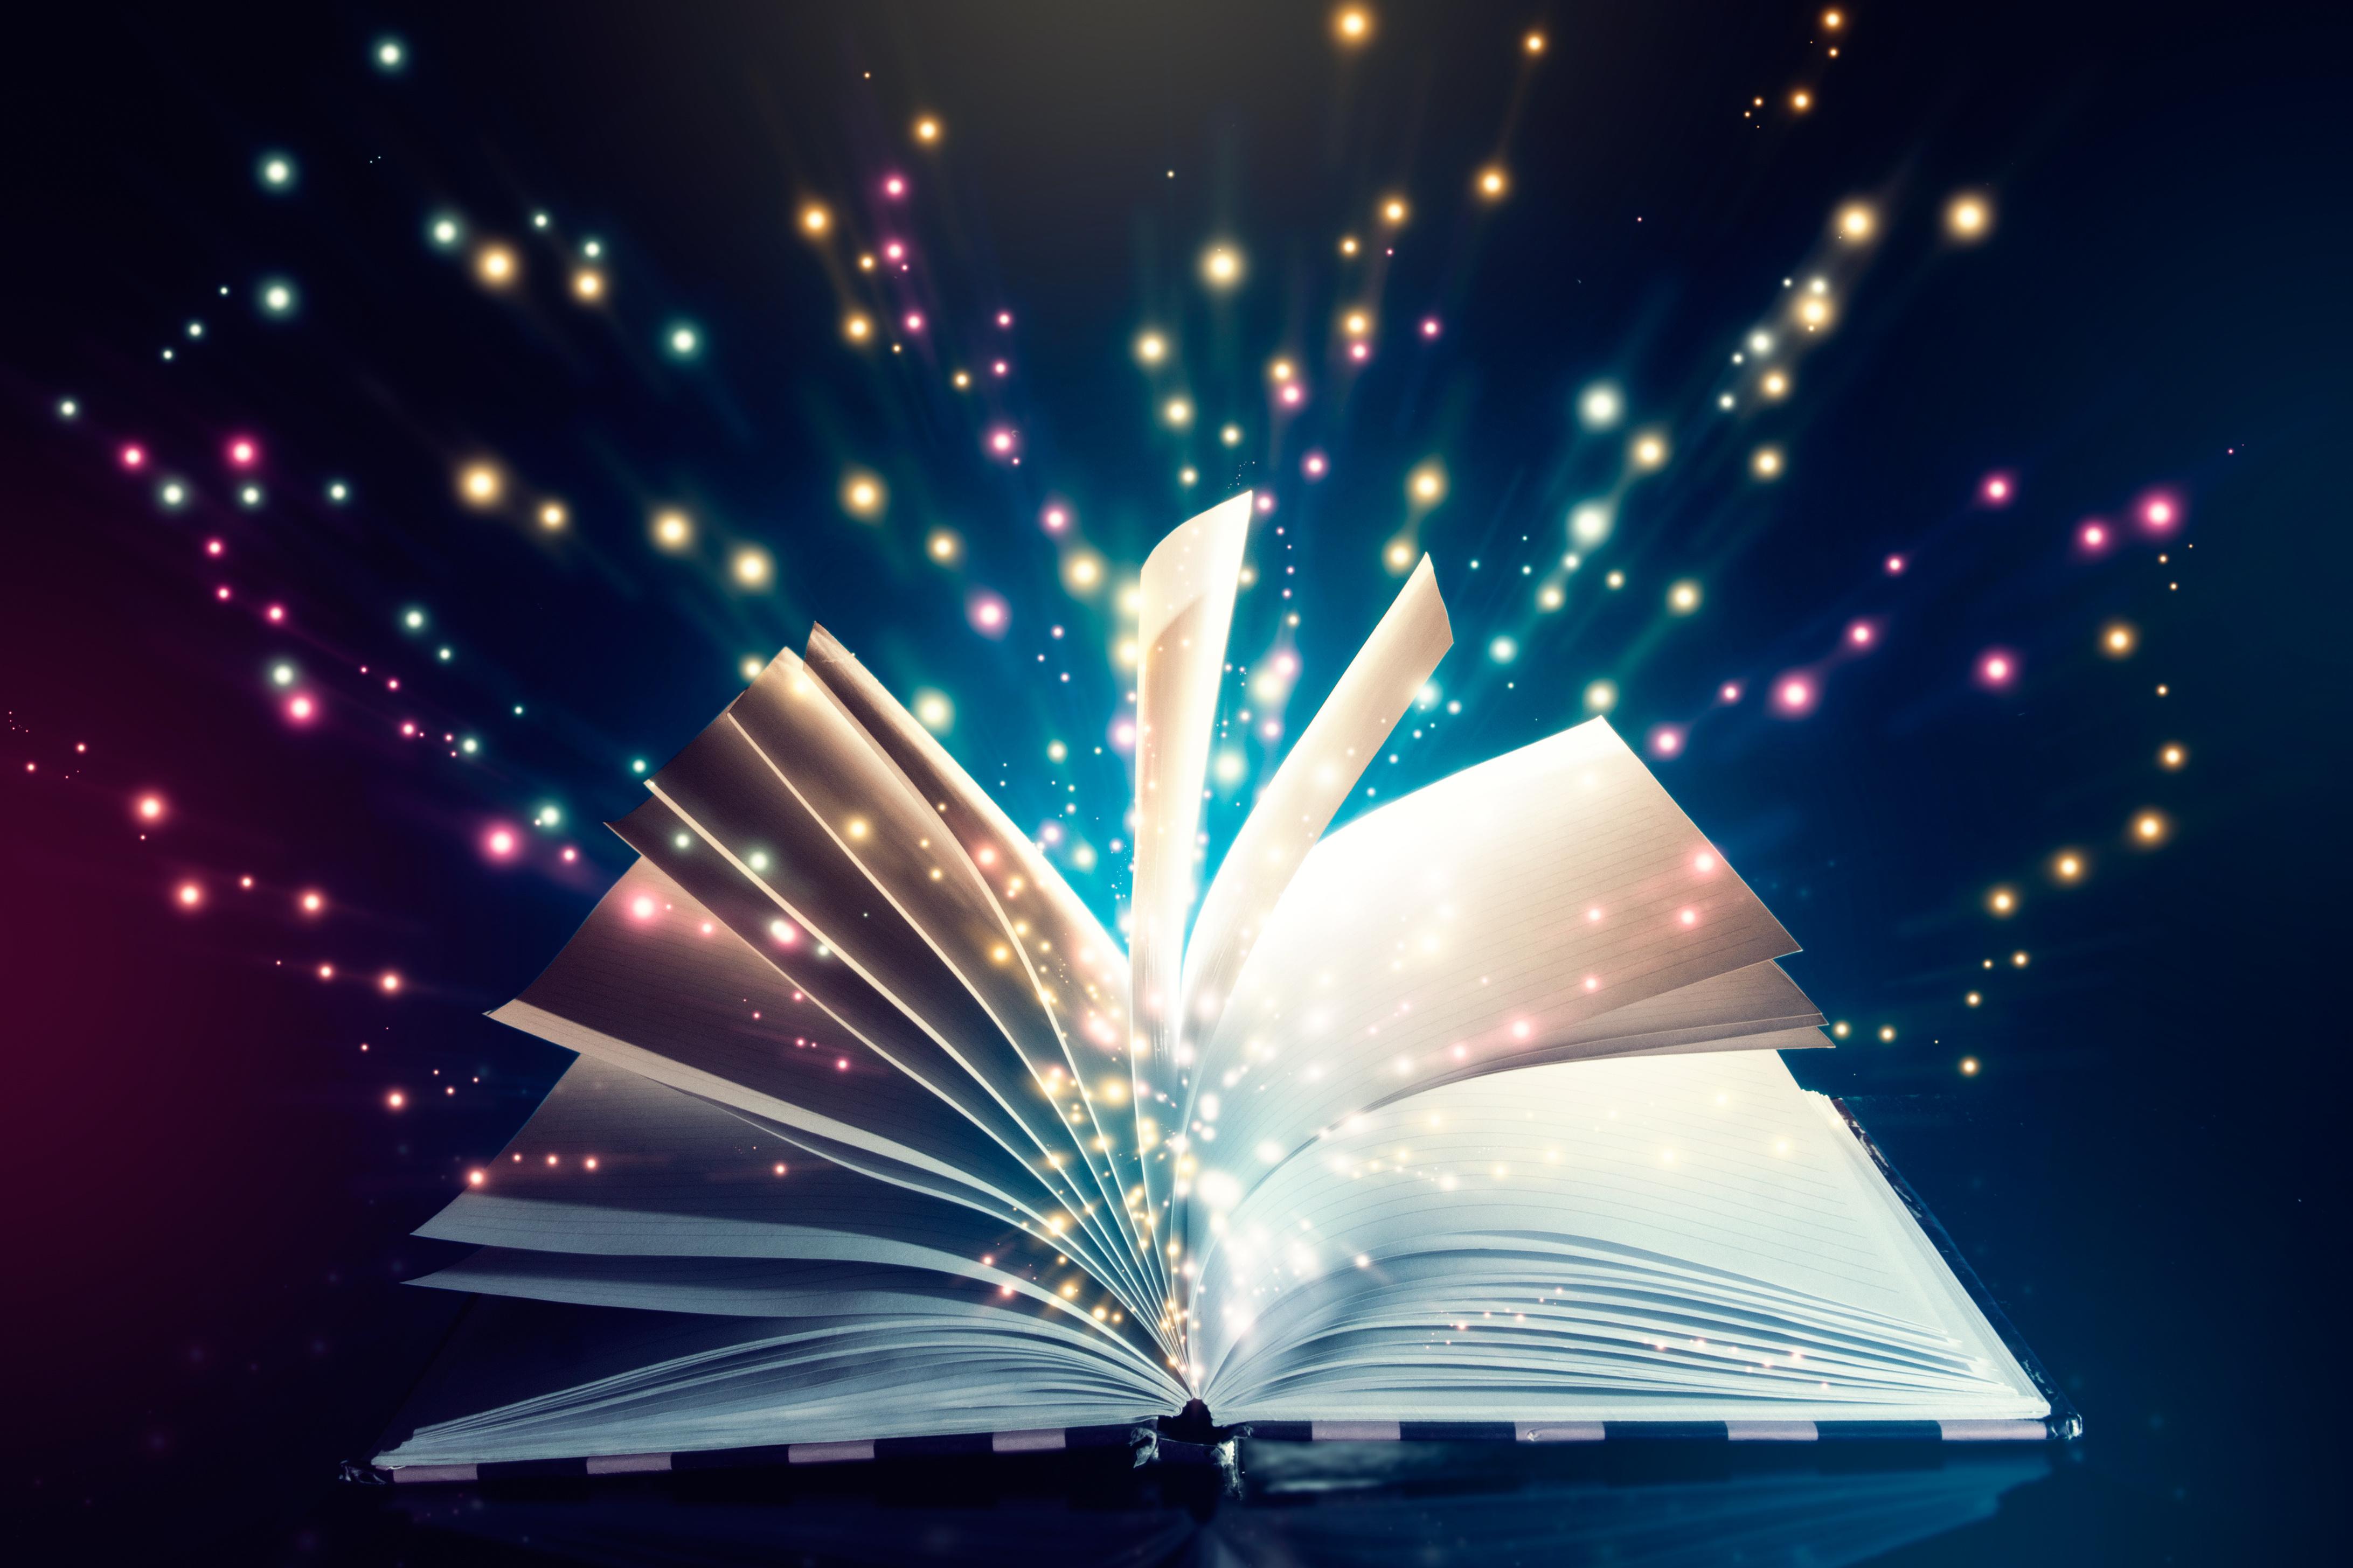 Fantasy Book 4367x2911